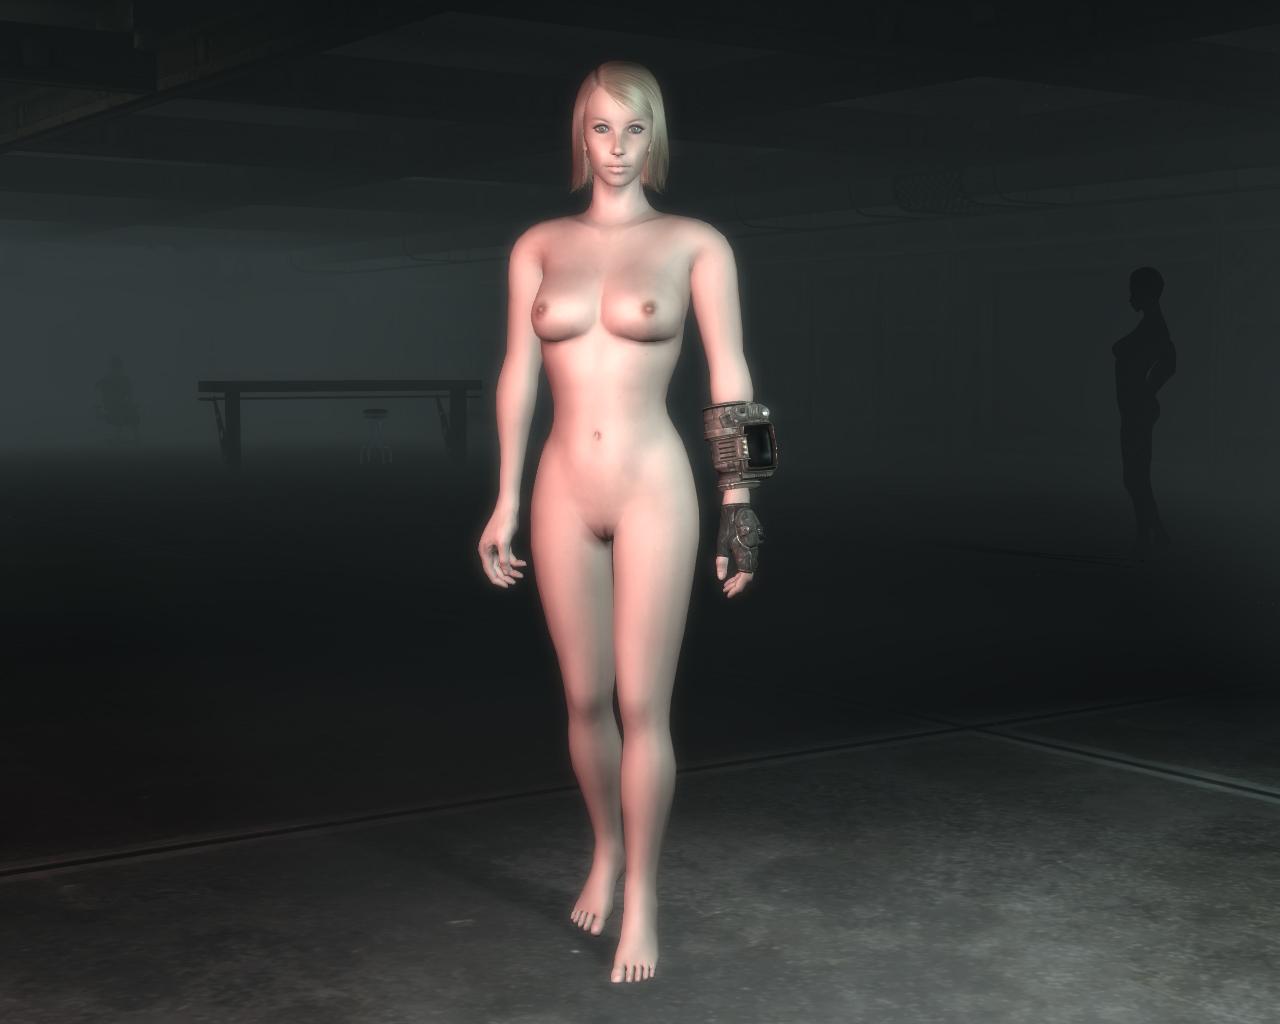 Hot nude xxx porn 3d video download porn wild singles